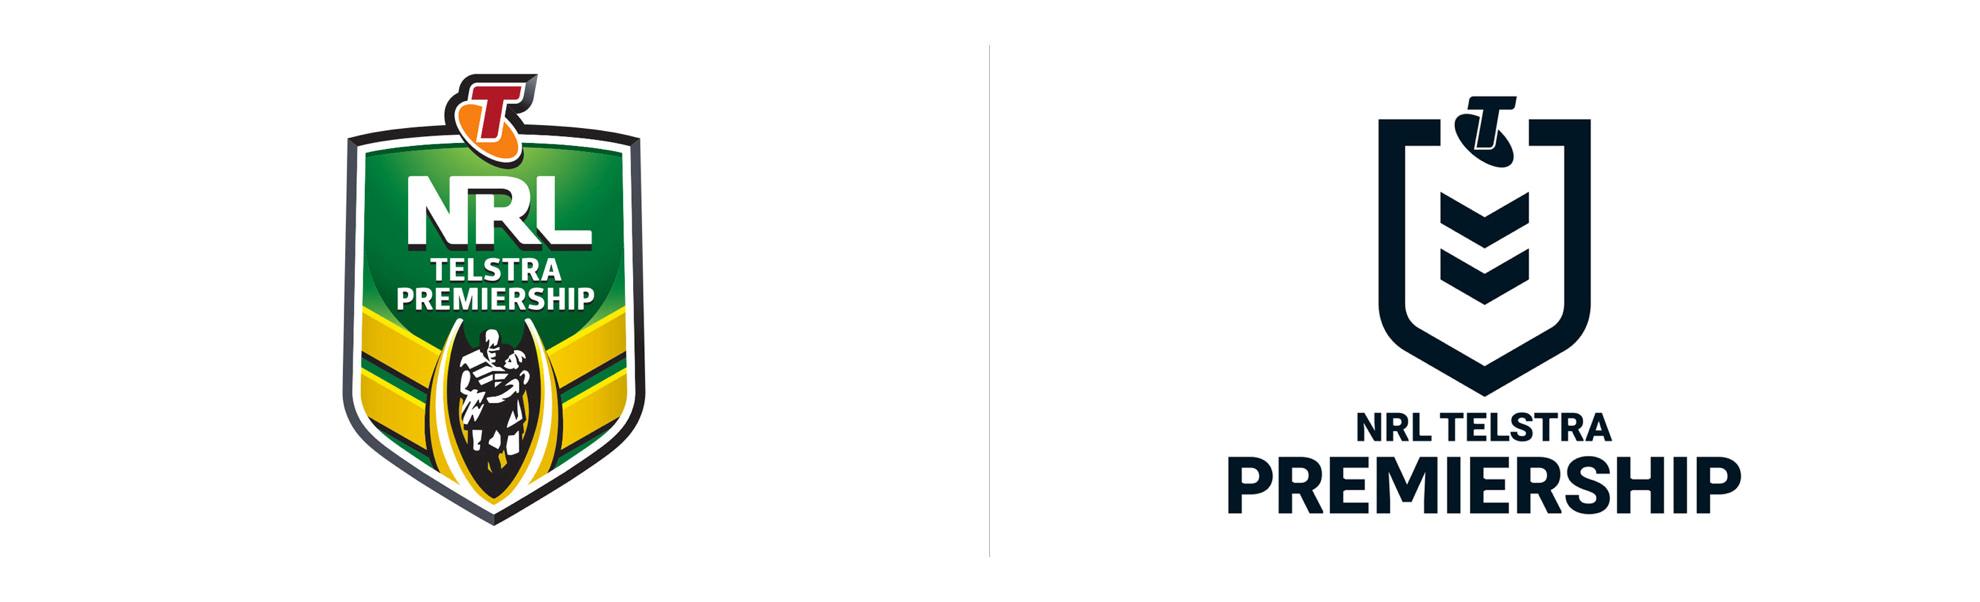 Nowe logo NRL Premiership